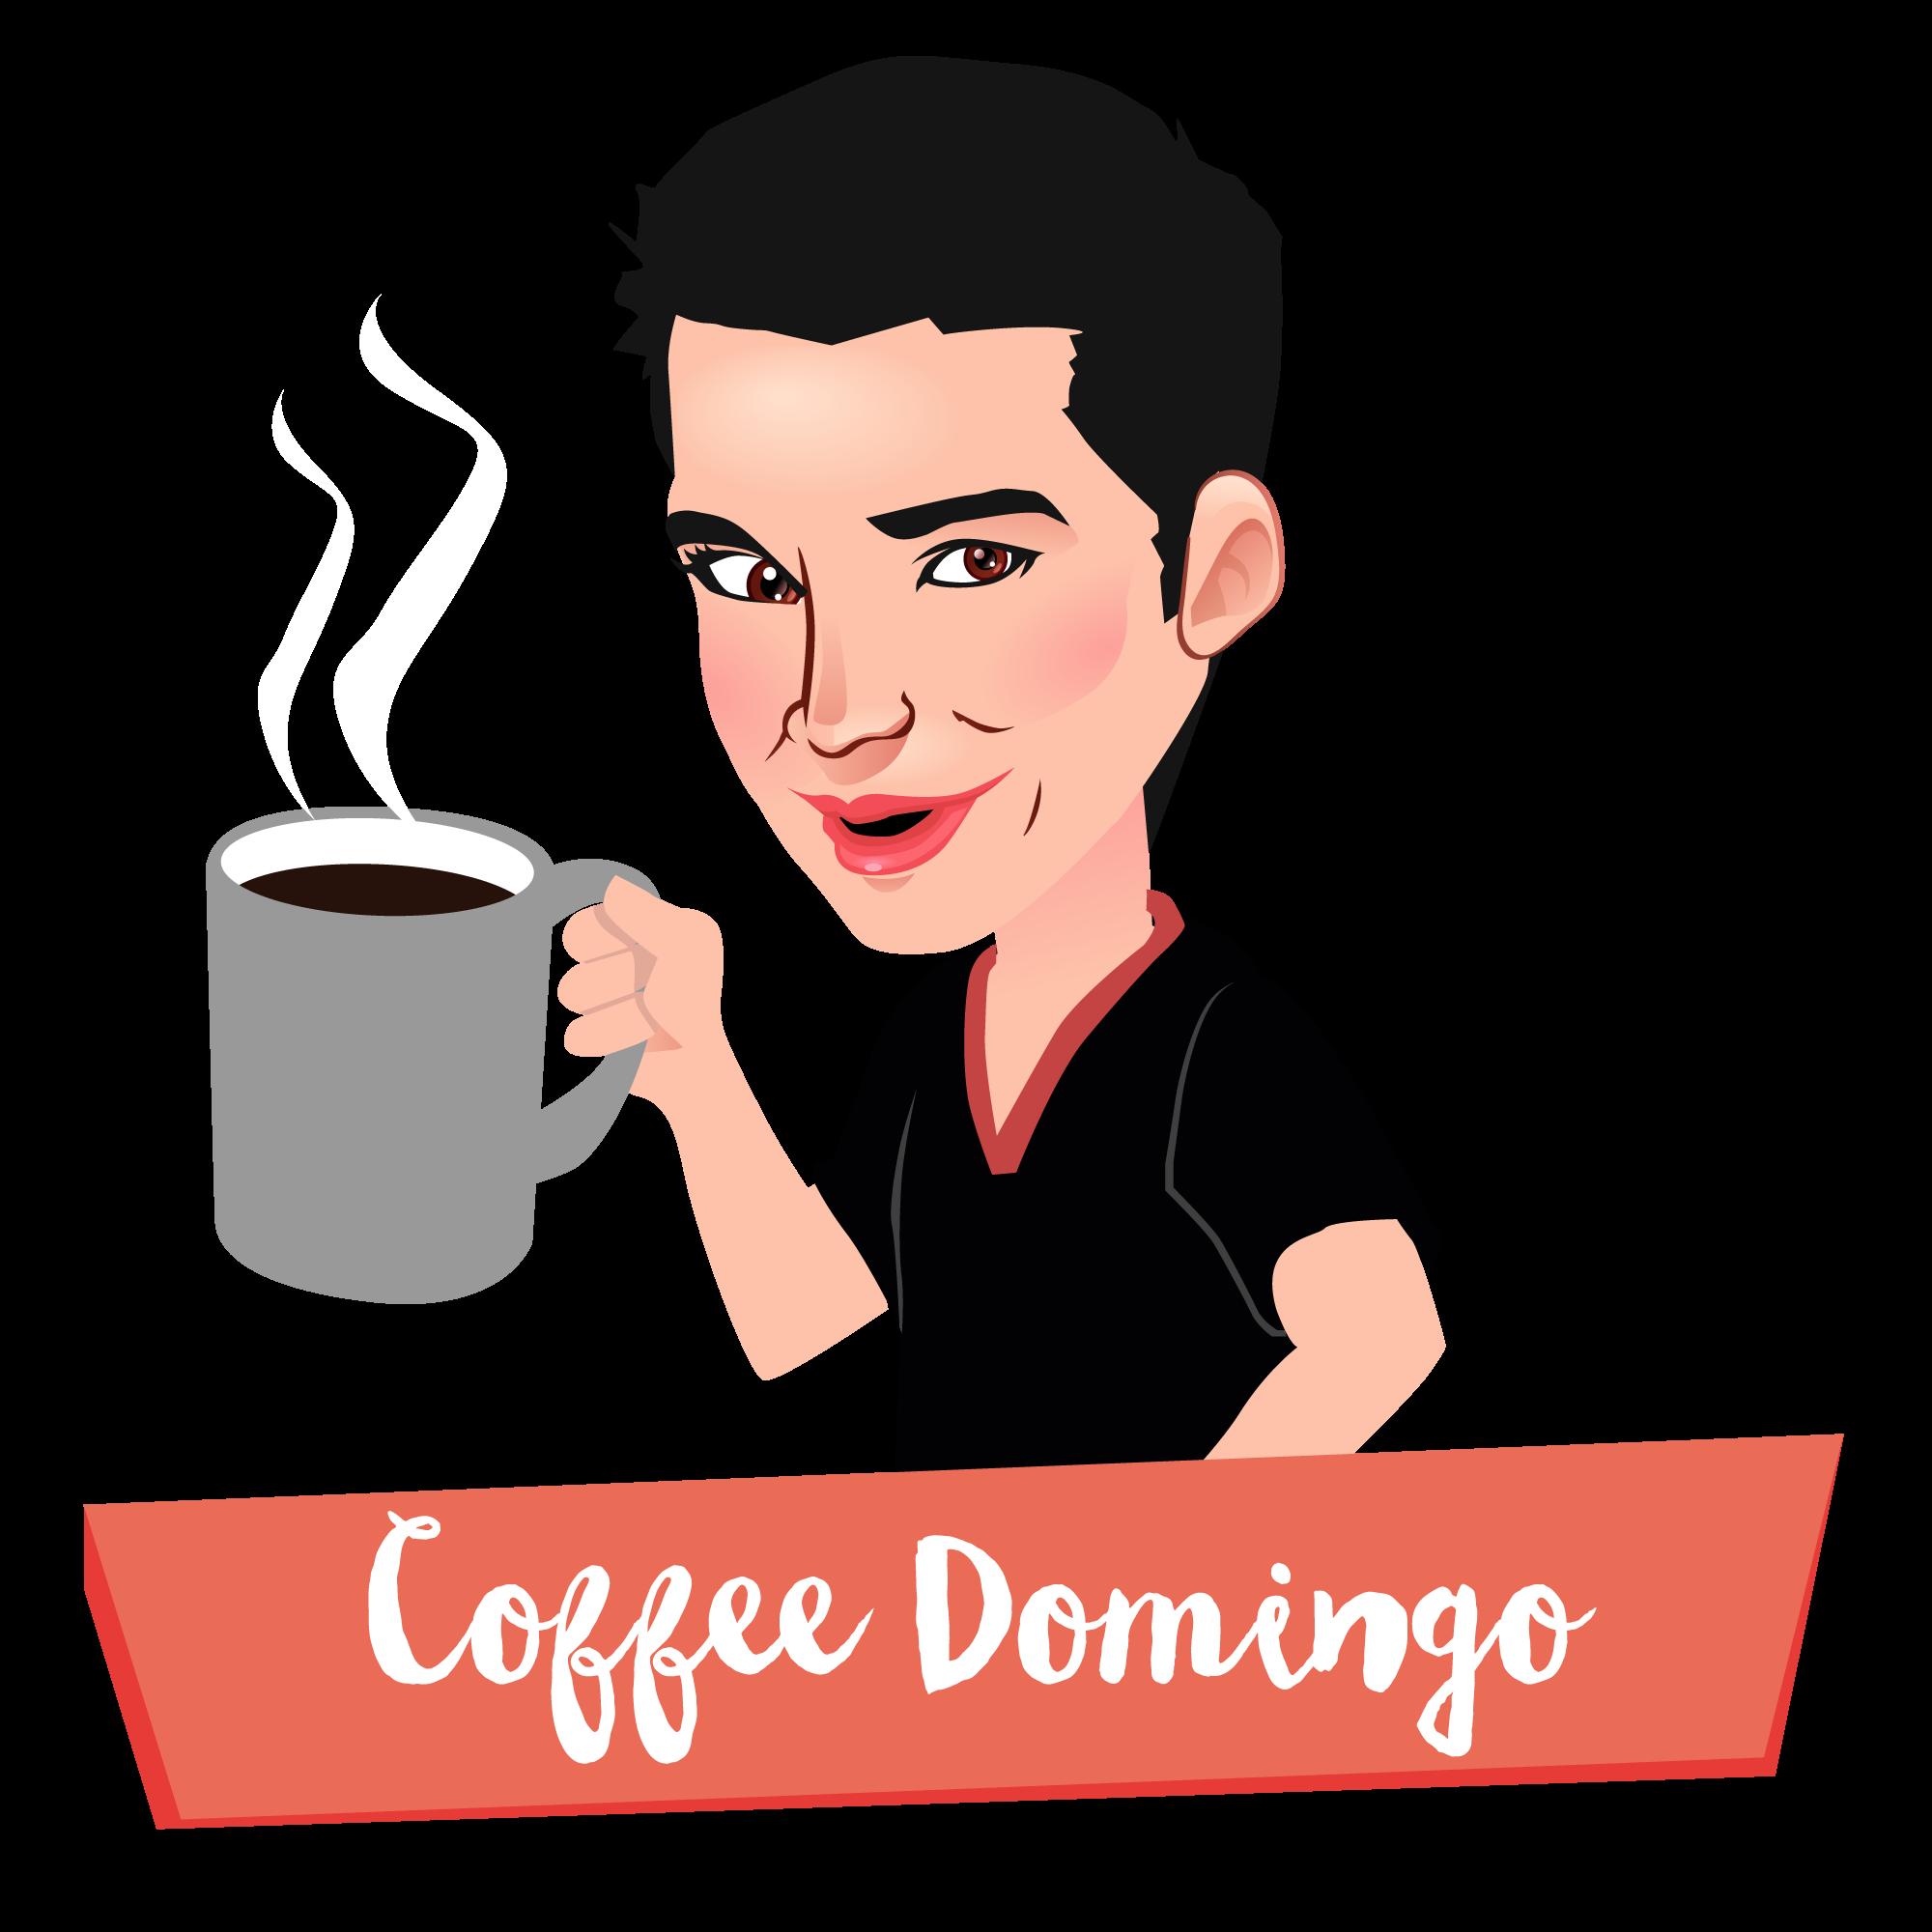 10 Uri ng Empleyado_Coffee Domingo